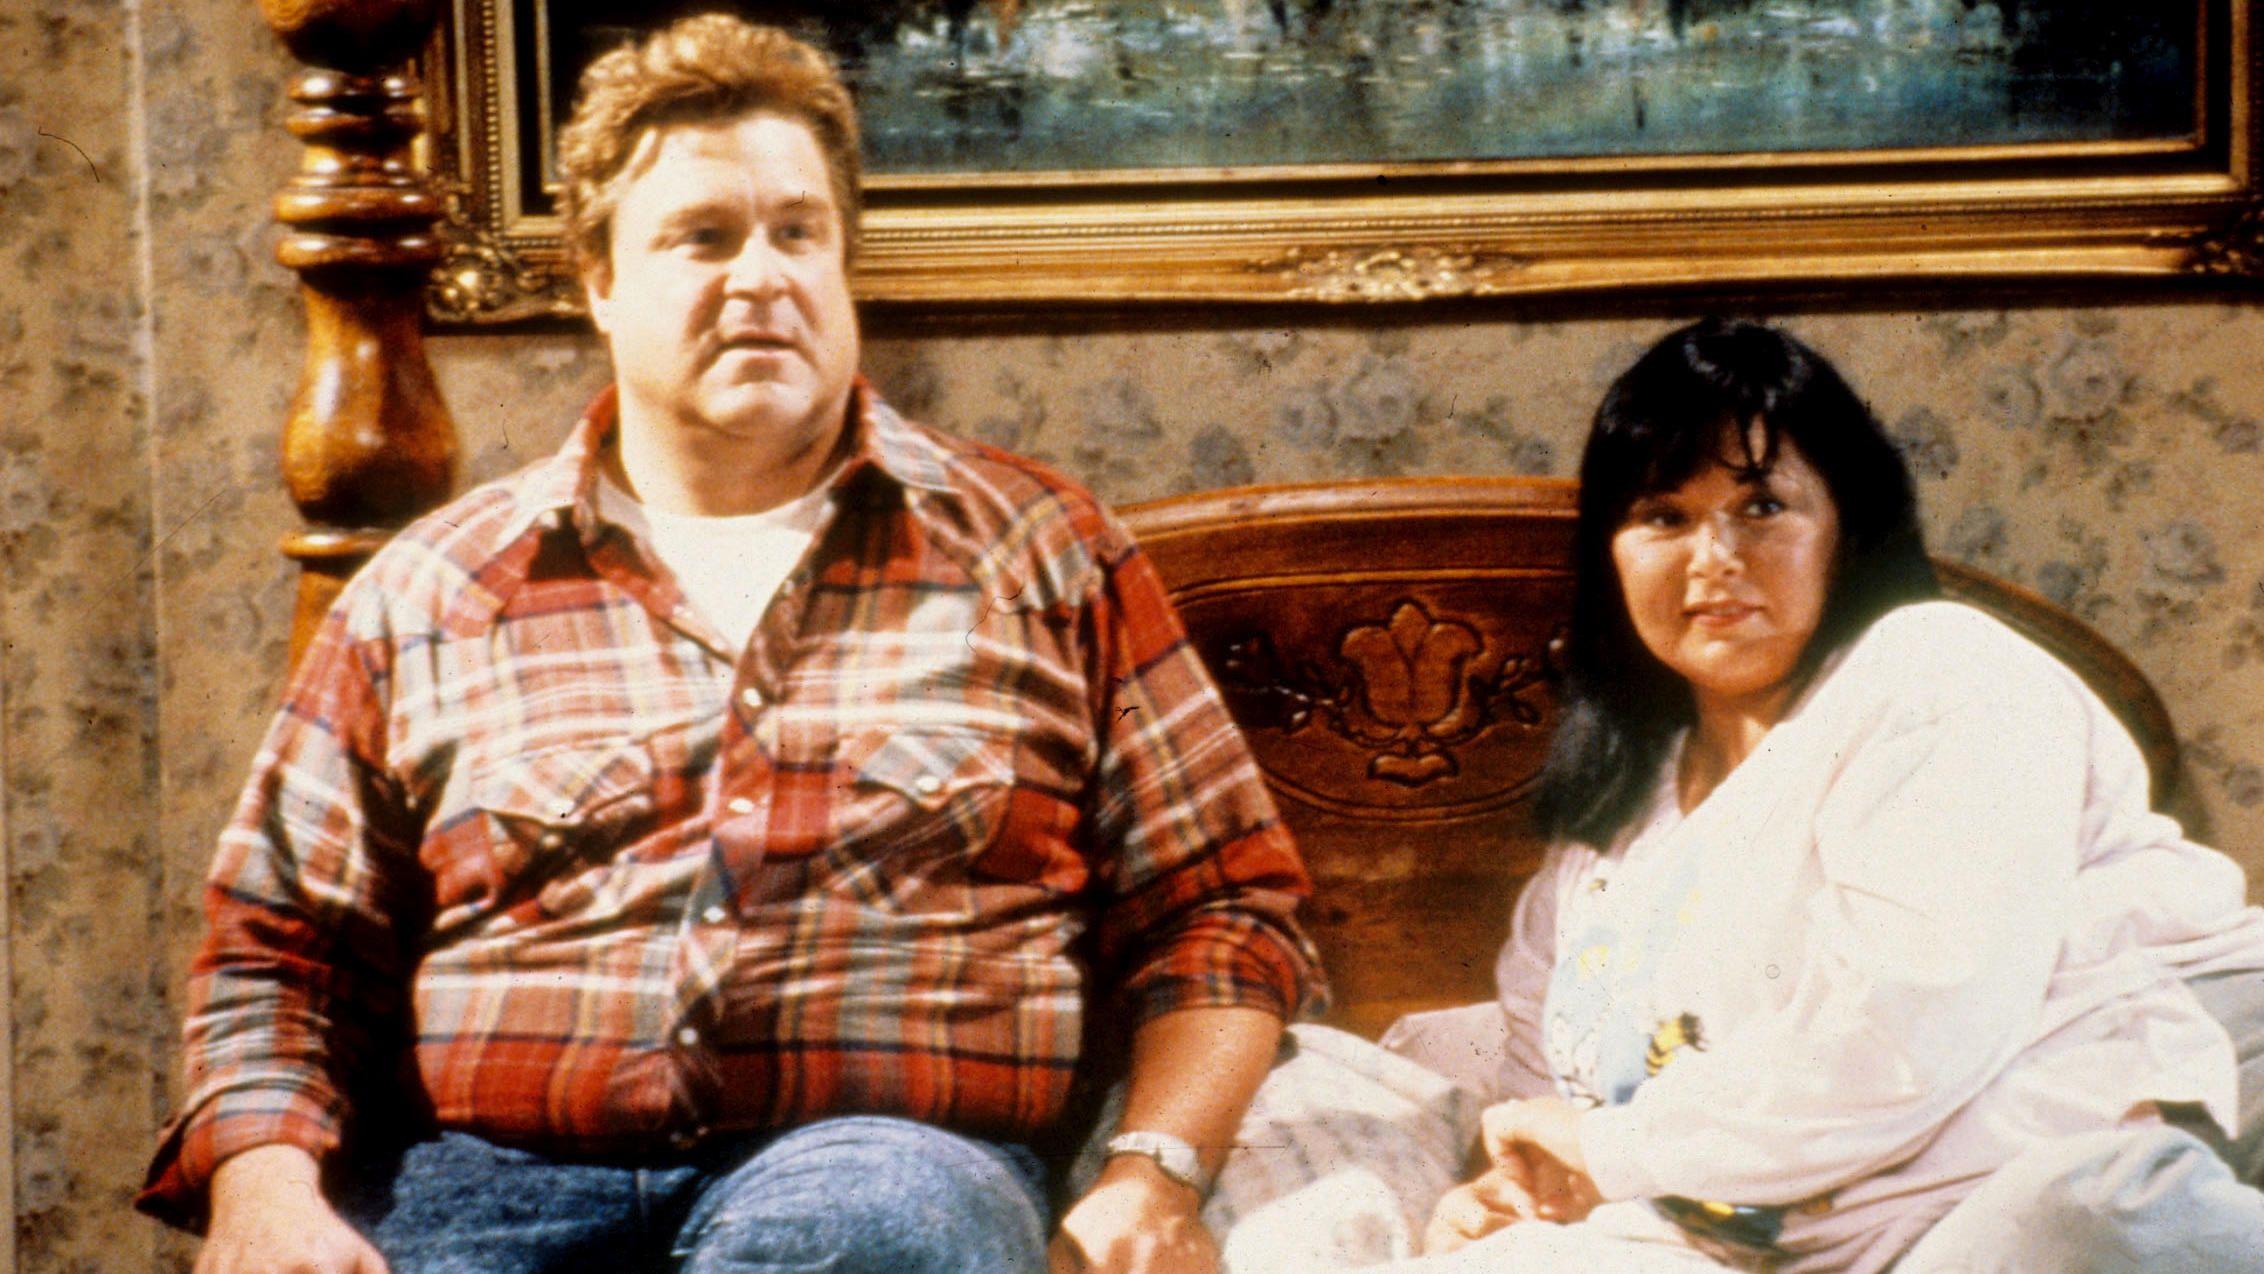 John Goodman Roseanne Barr